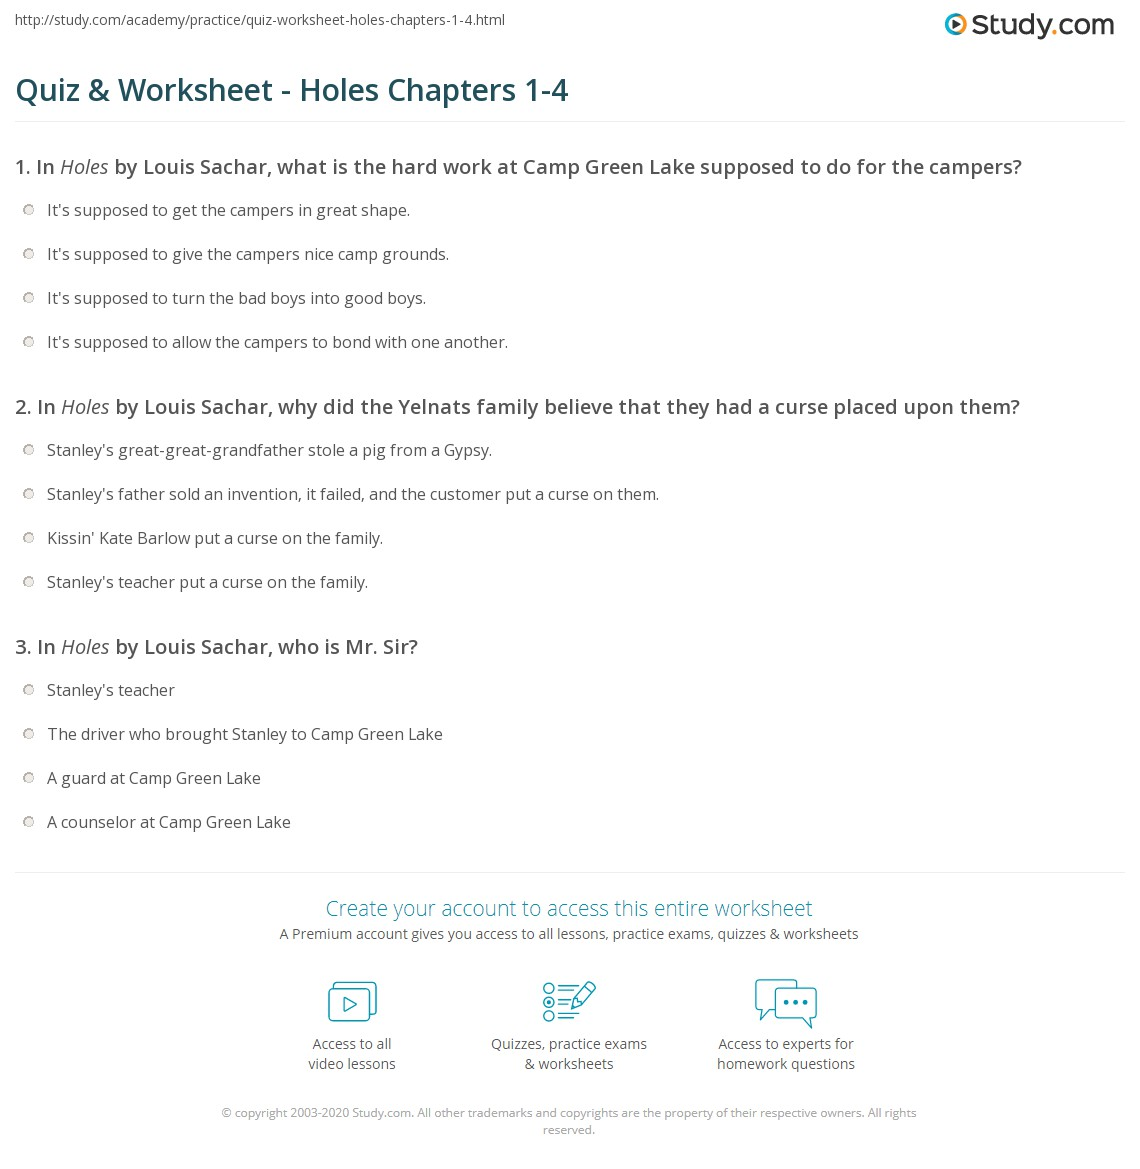 worksheet Holes Worksheets quiz worksheet holes chapters 1 4 study com print summaries worksheet